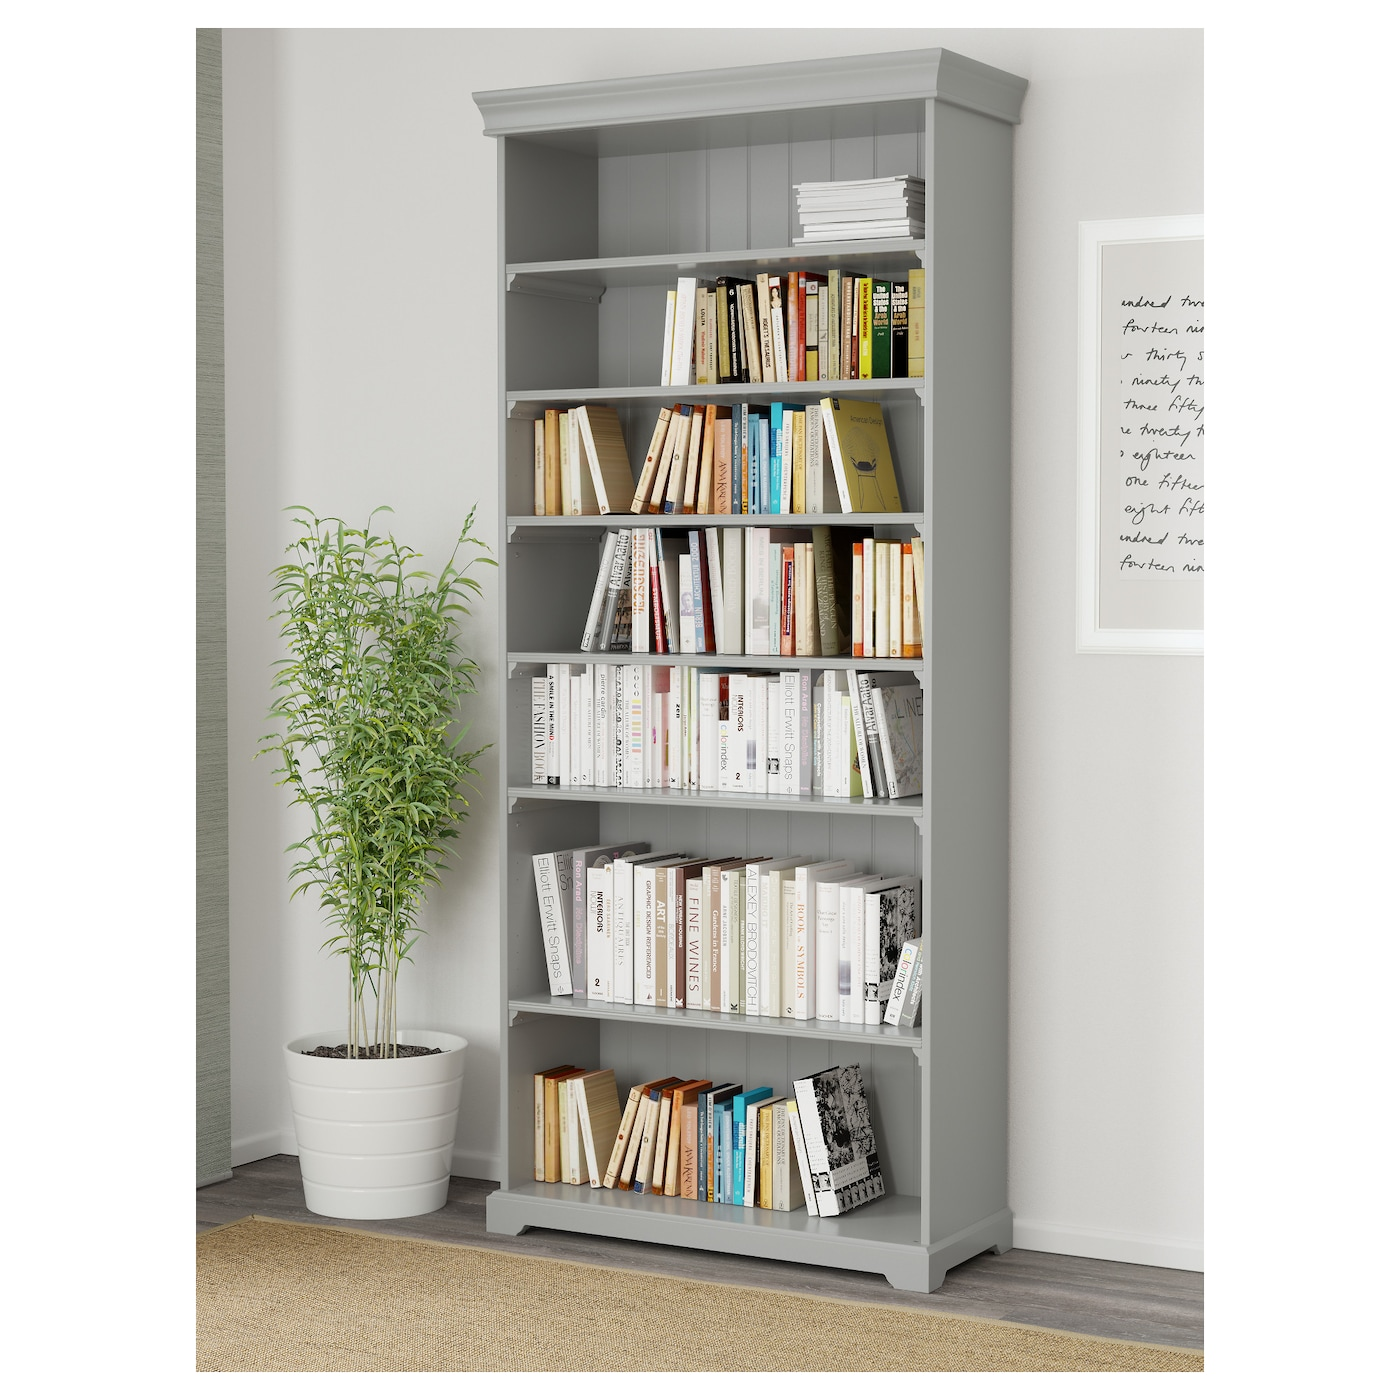 bookshelf mysize bookcase delta children grey hi products res angle left